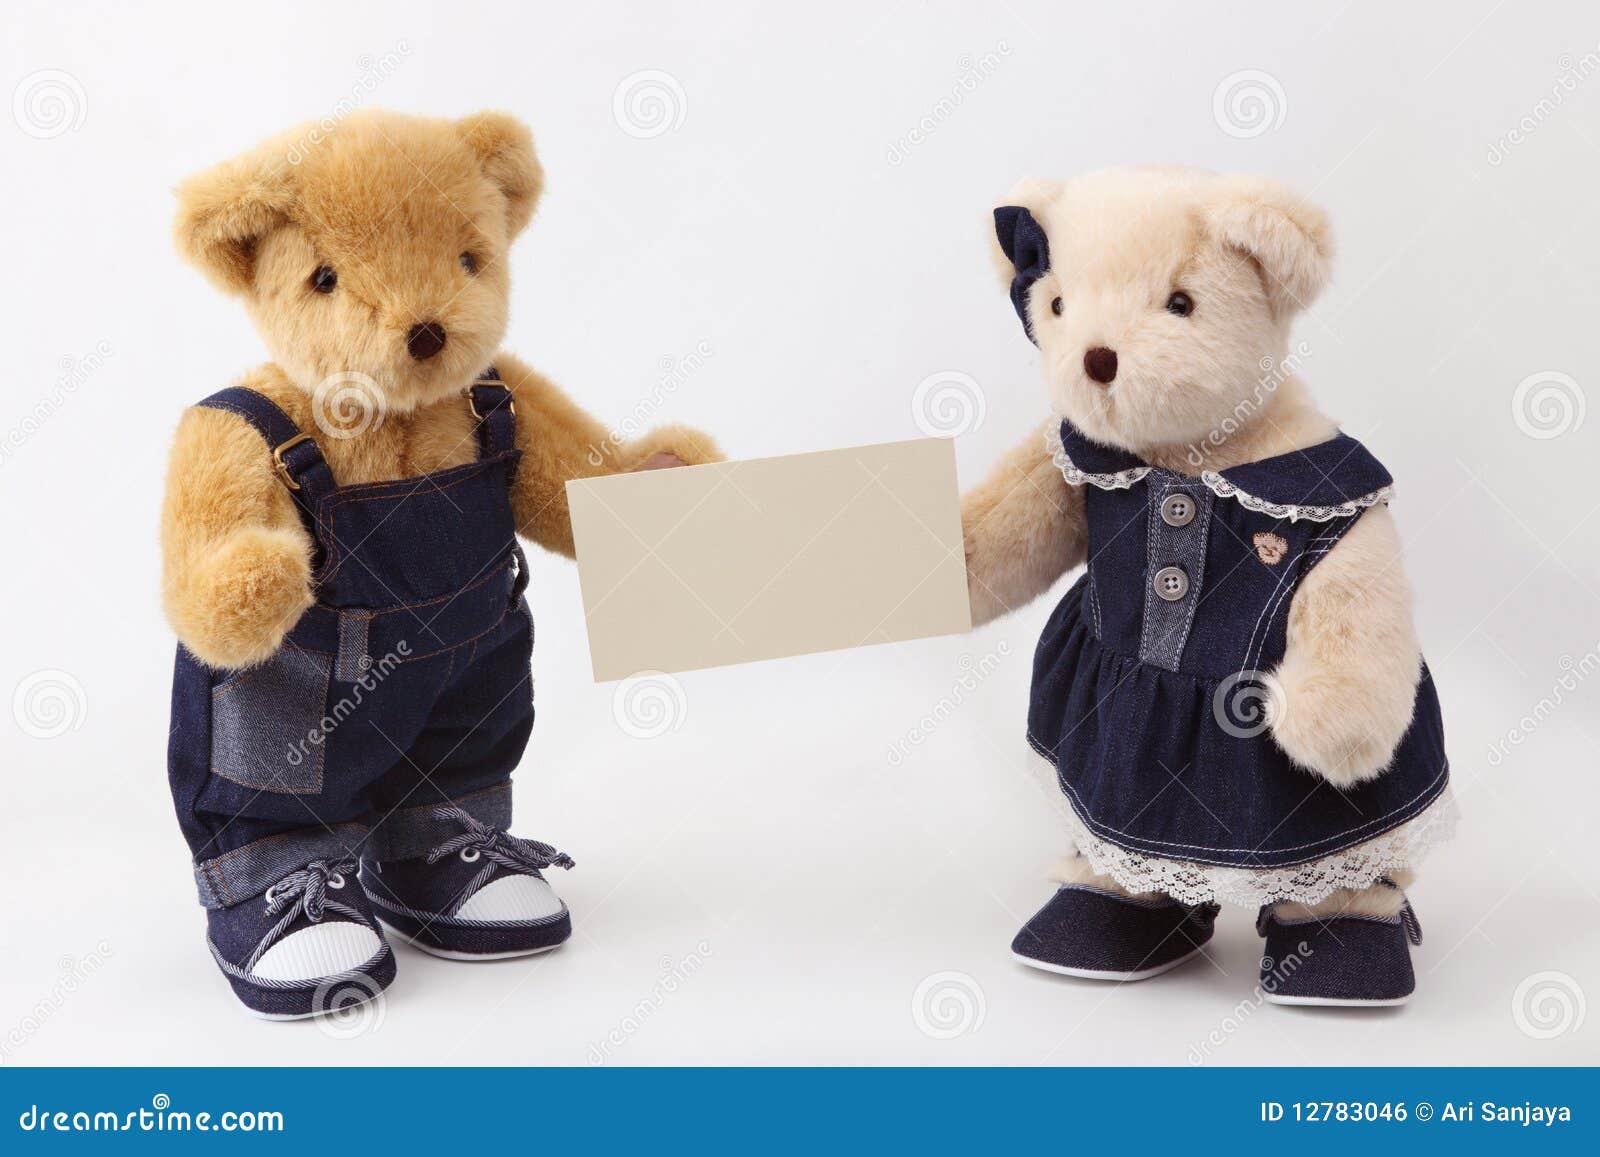 Teddy Bear Clipart, Clip Art Illustrations, Images